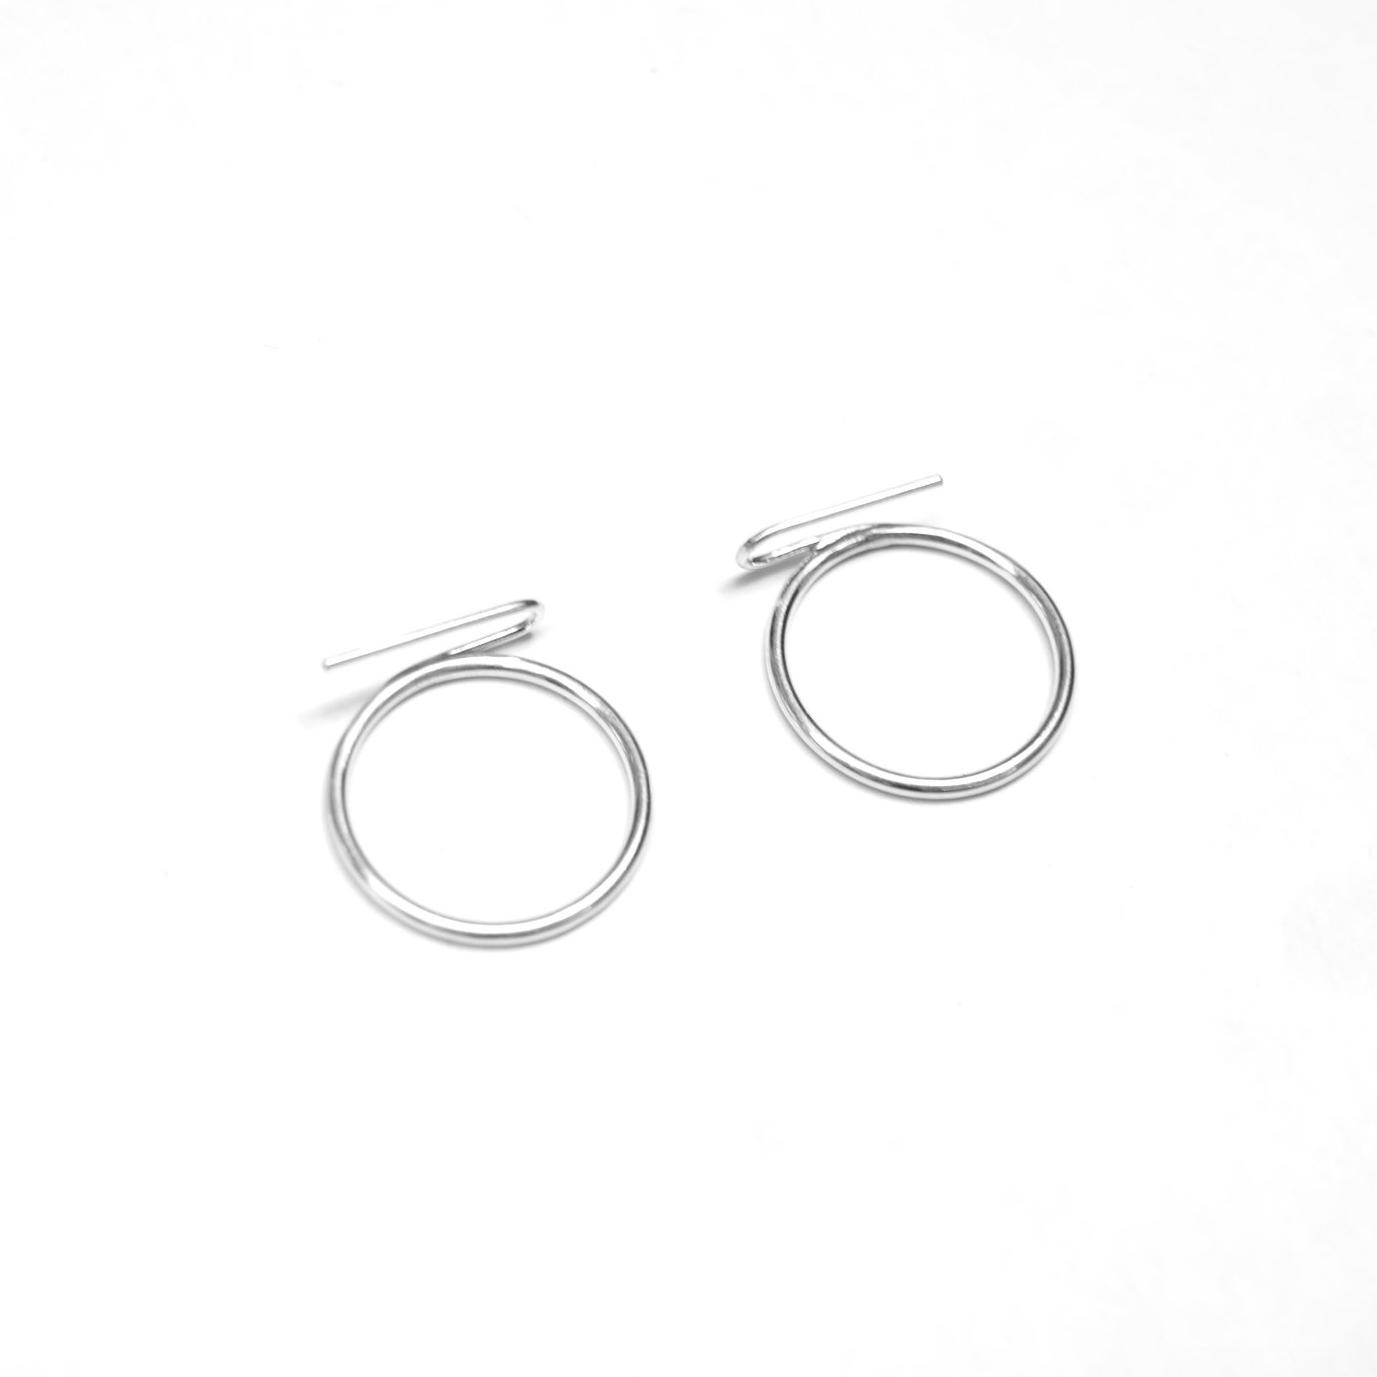 CLIMBER EARRINGS - RING